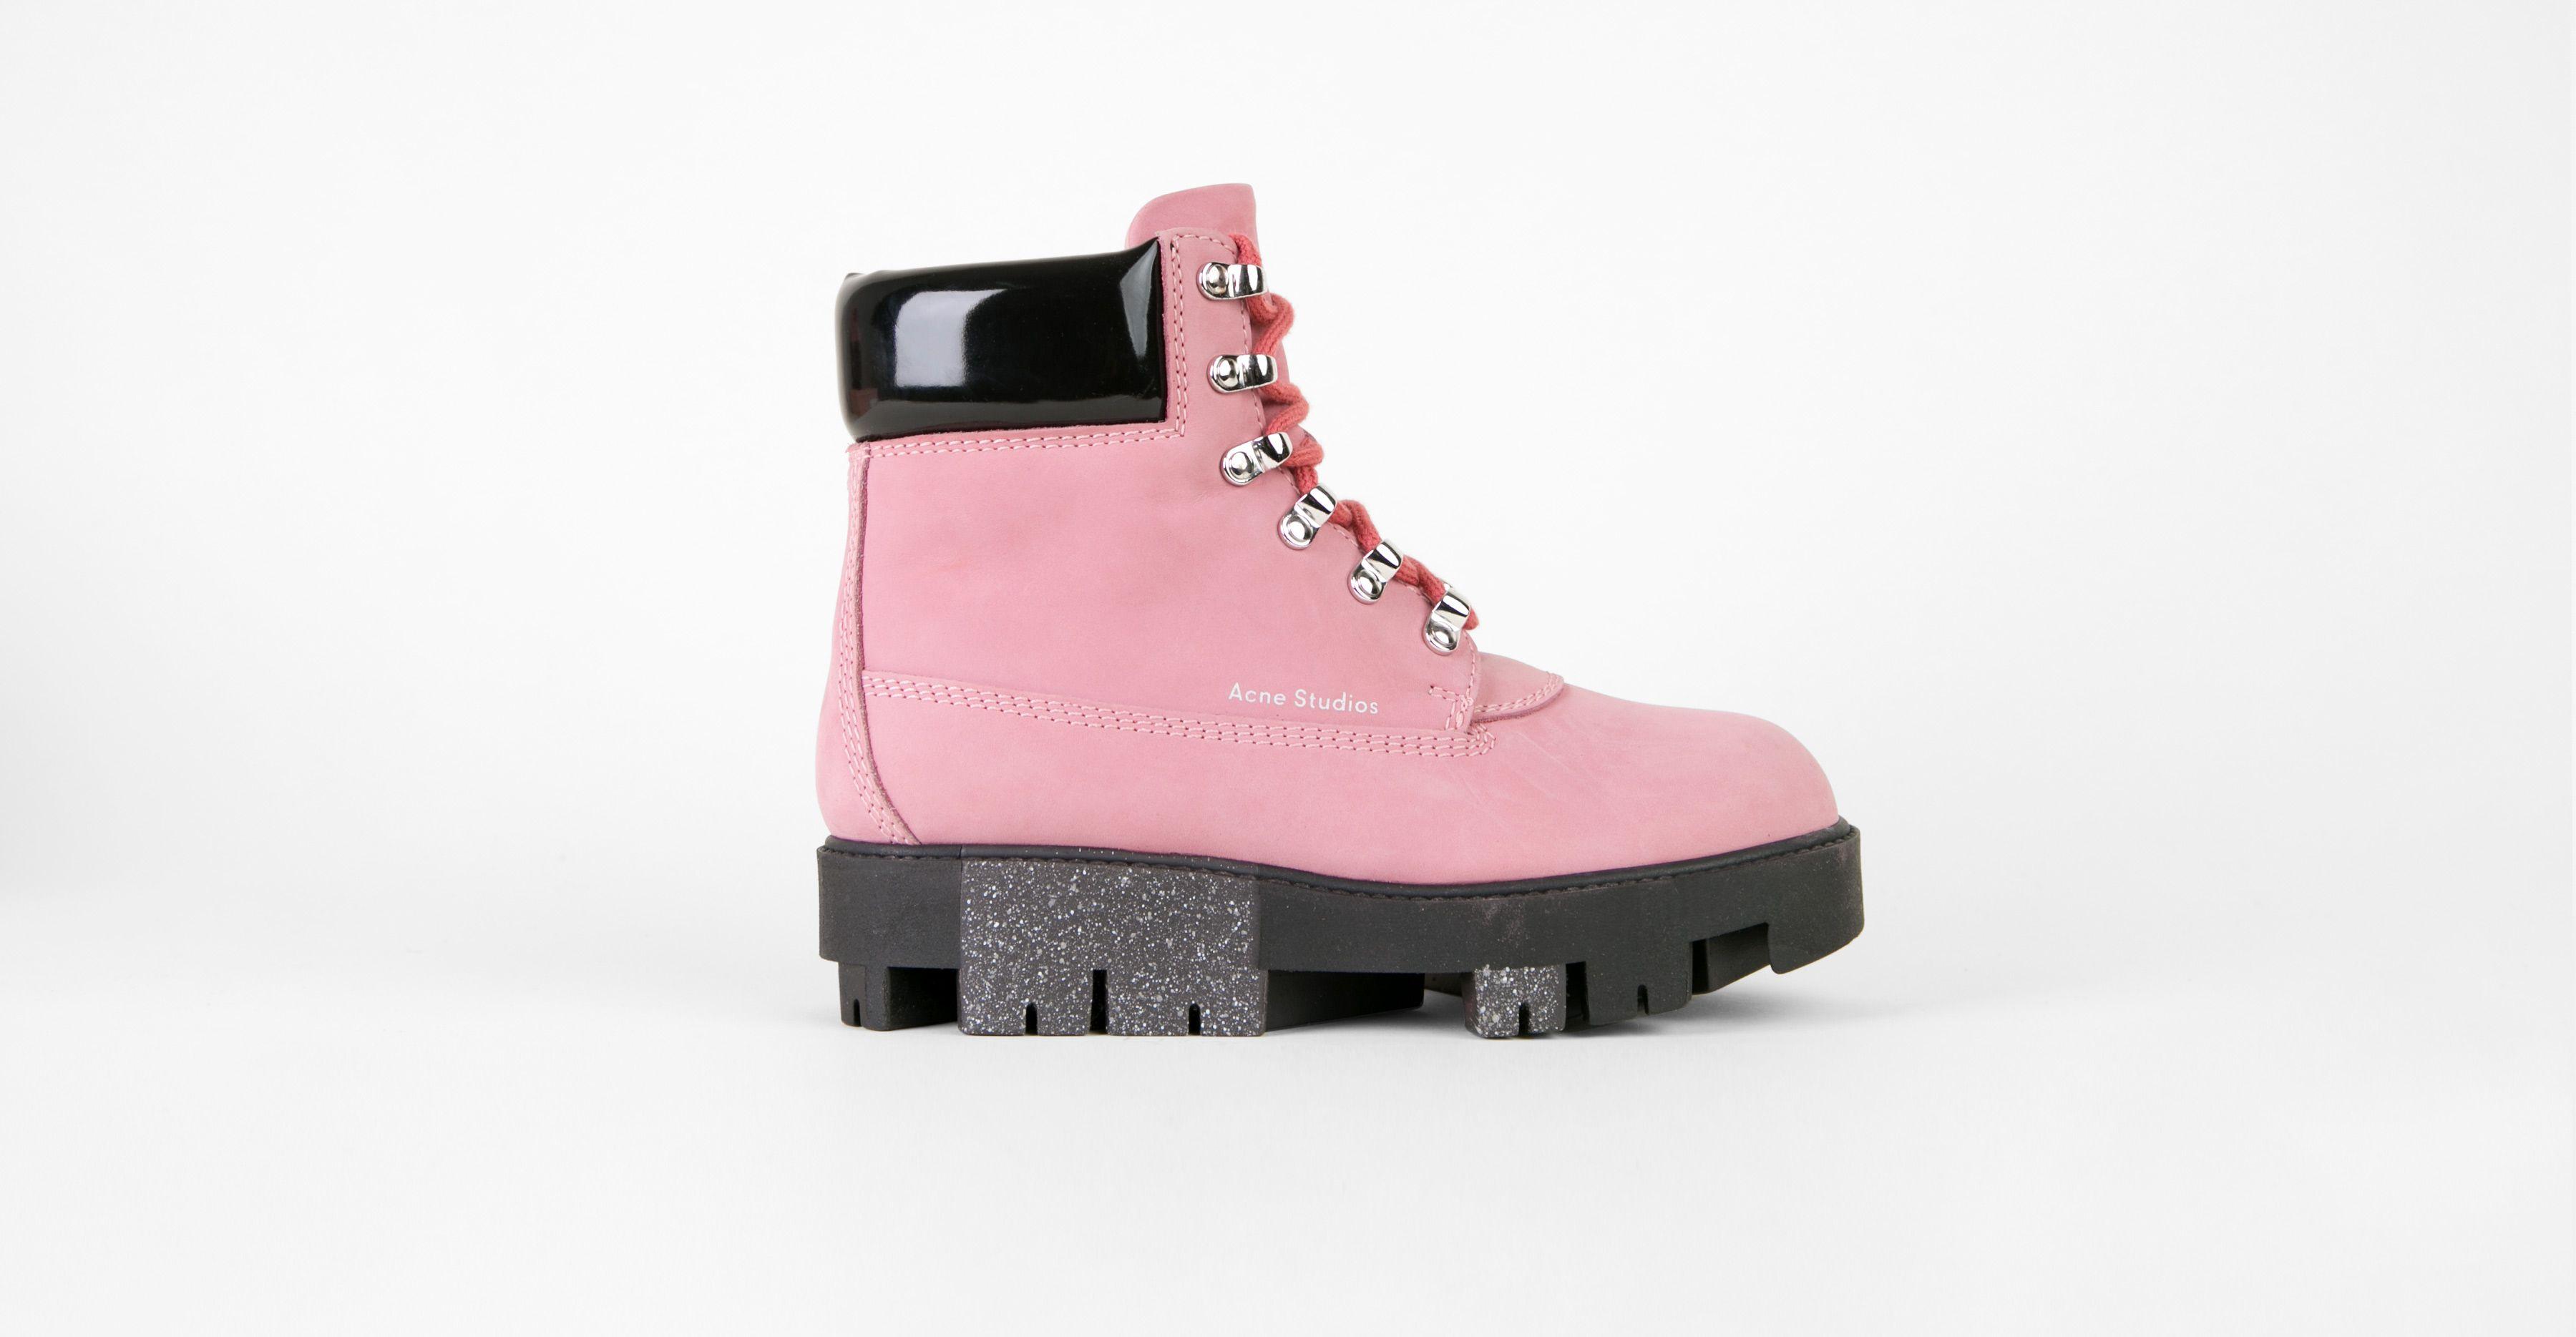 acne-studios-telde-boot-bubble-pink-black-2